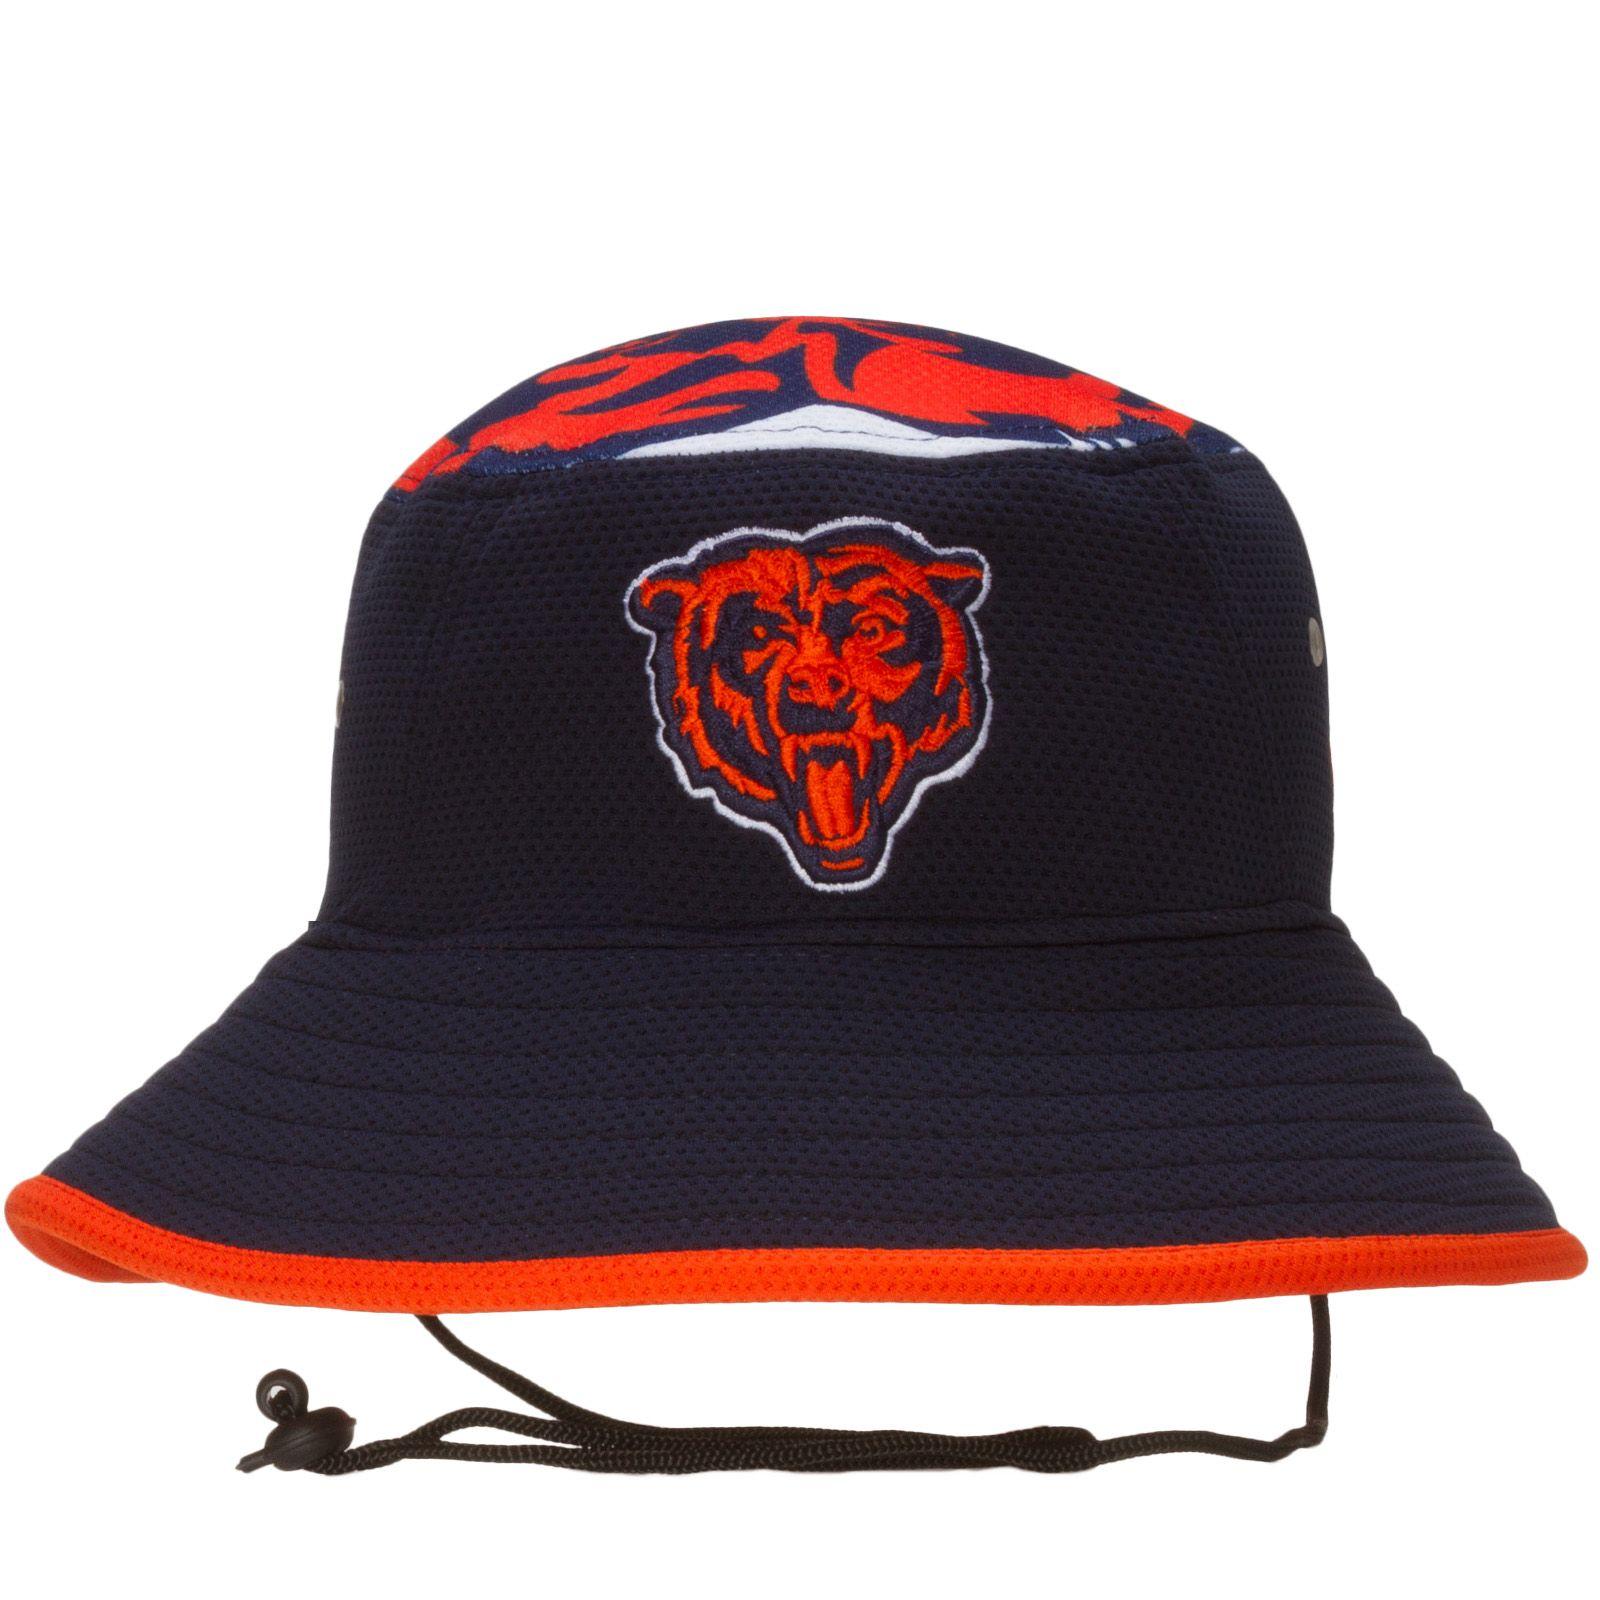 8bb2319ec9ad7 Chicago Bears Navy and Orange Logo Topper Bucket Hat by New Era  Chicago   Bears  ChicagoBears